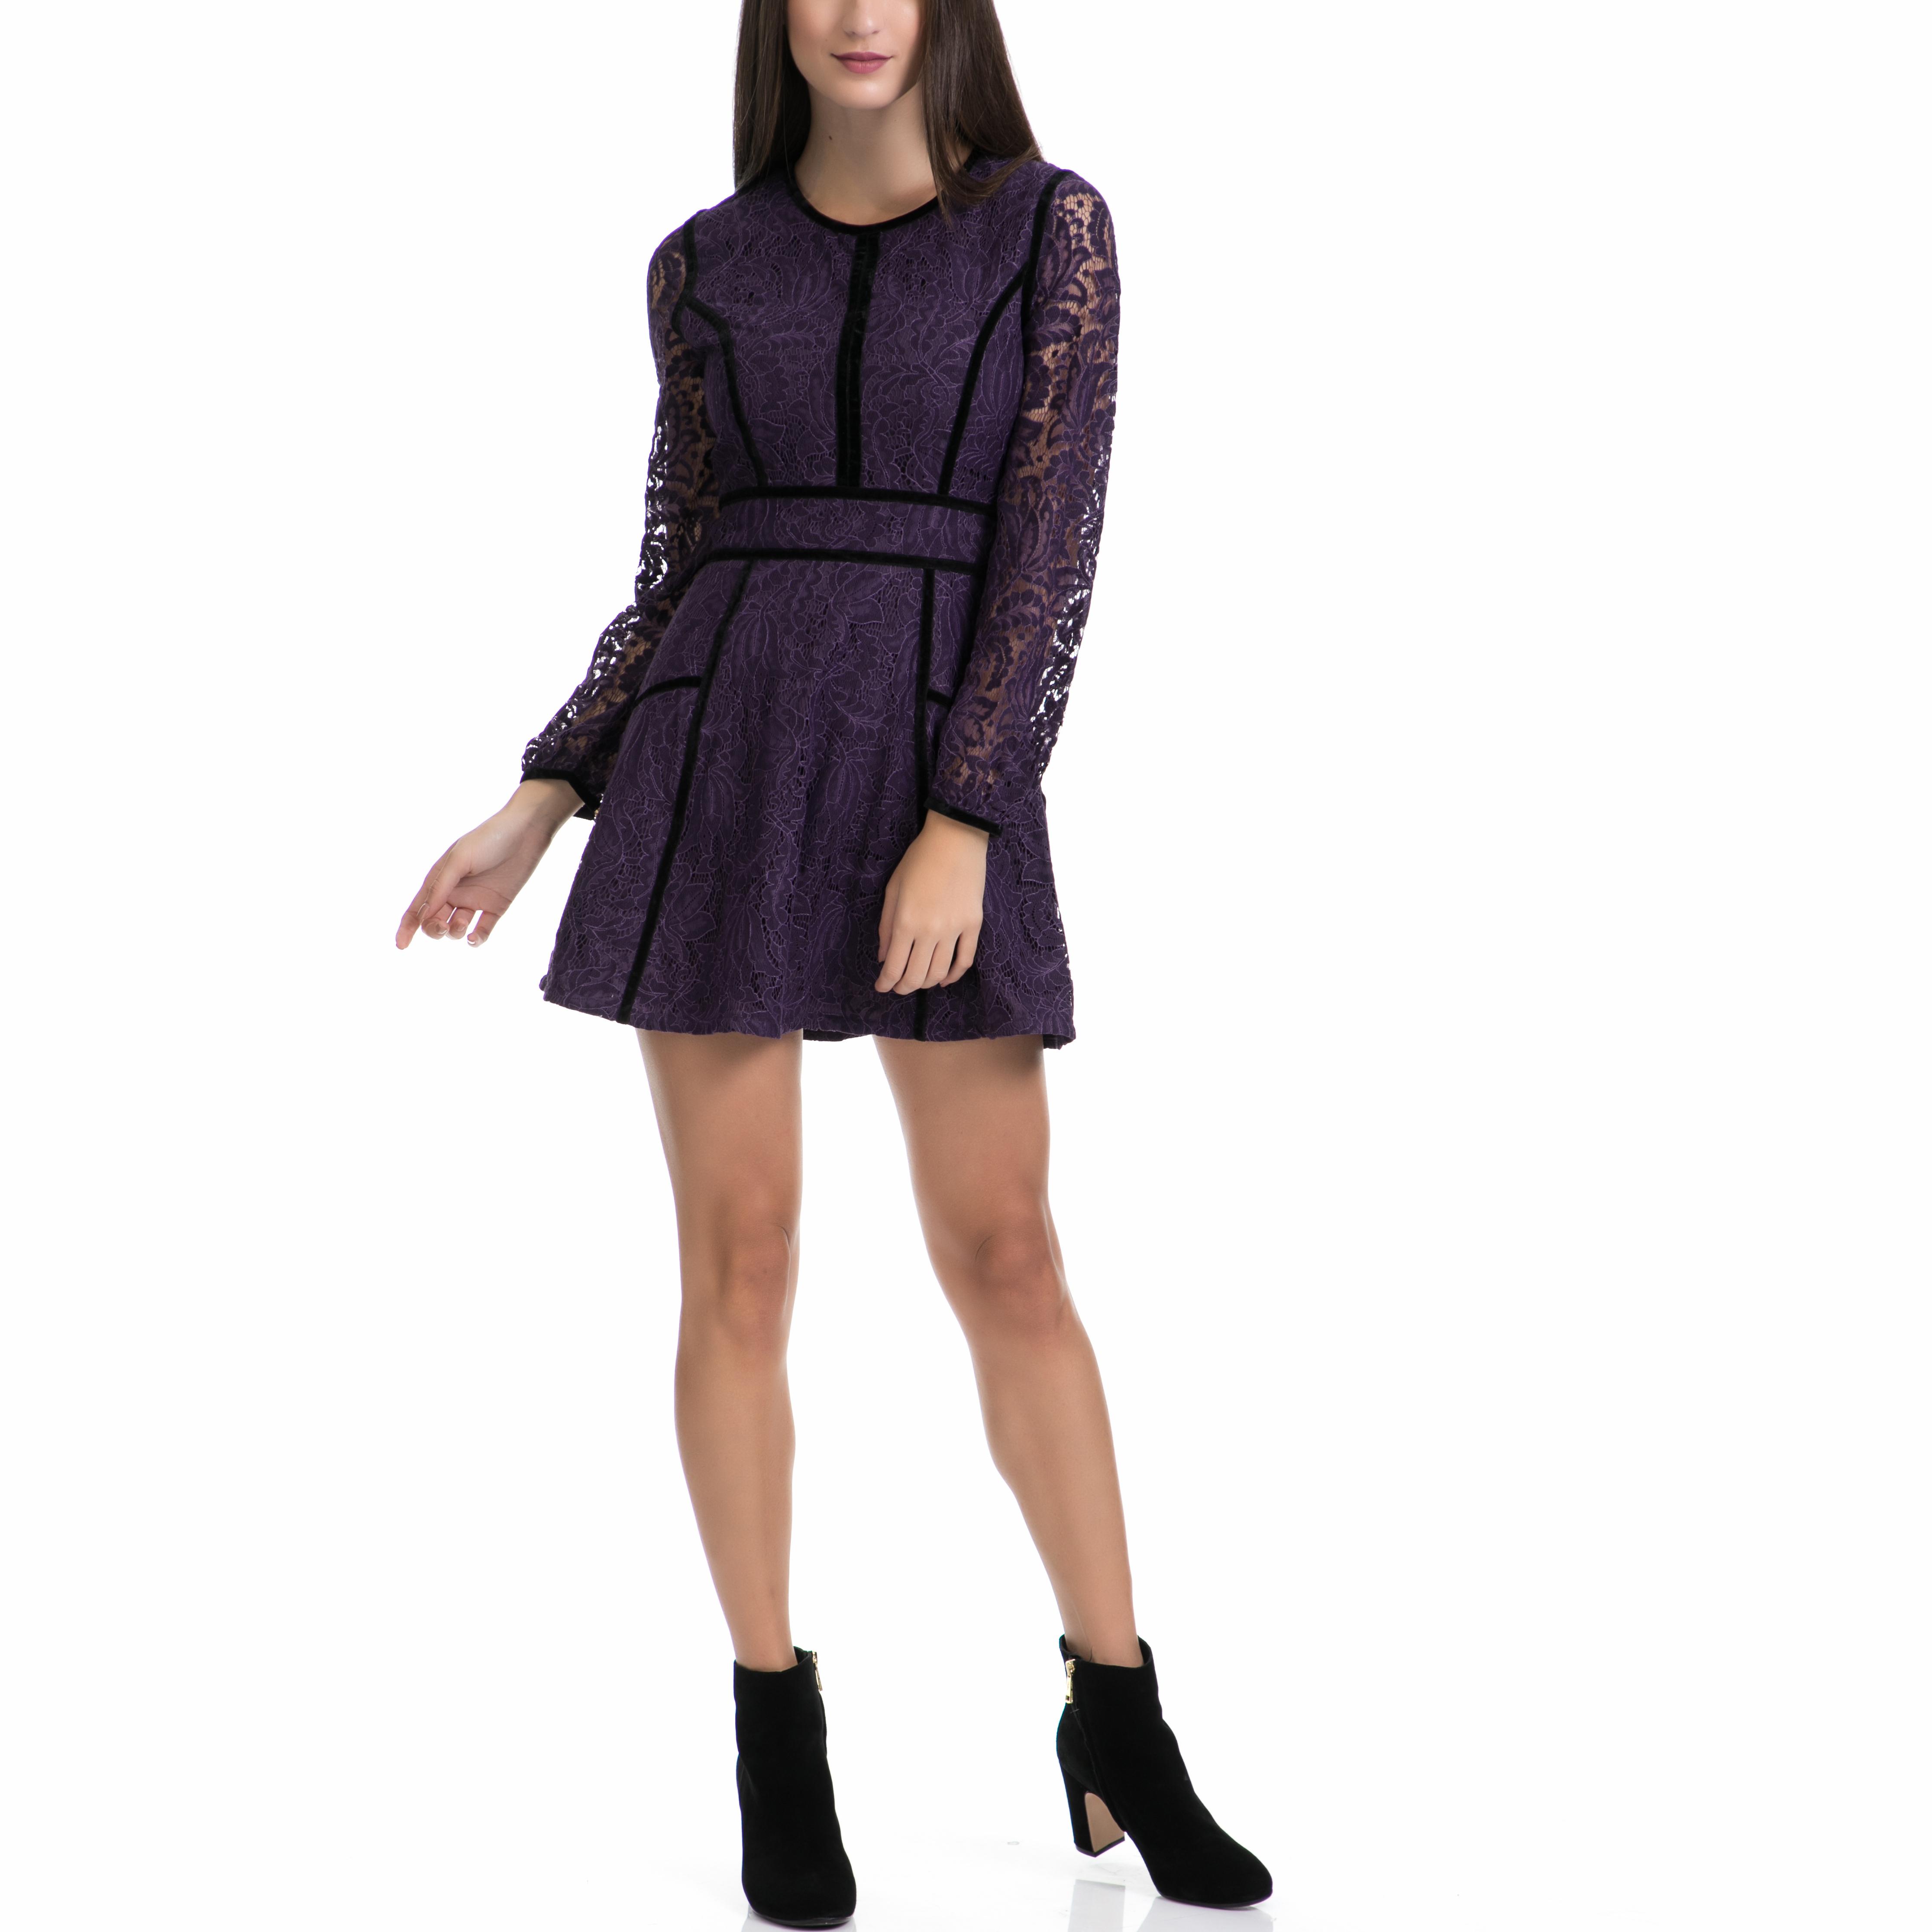 JUICY COUTURE - Φόρεμα JUICY COUTURE μωβ γυναικεία ρούχα φορέματα μίνι